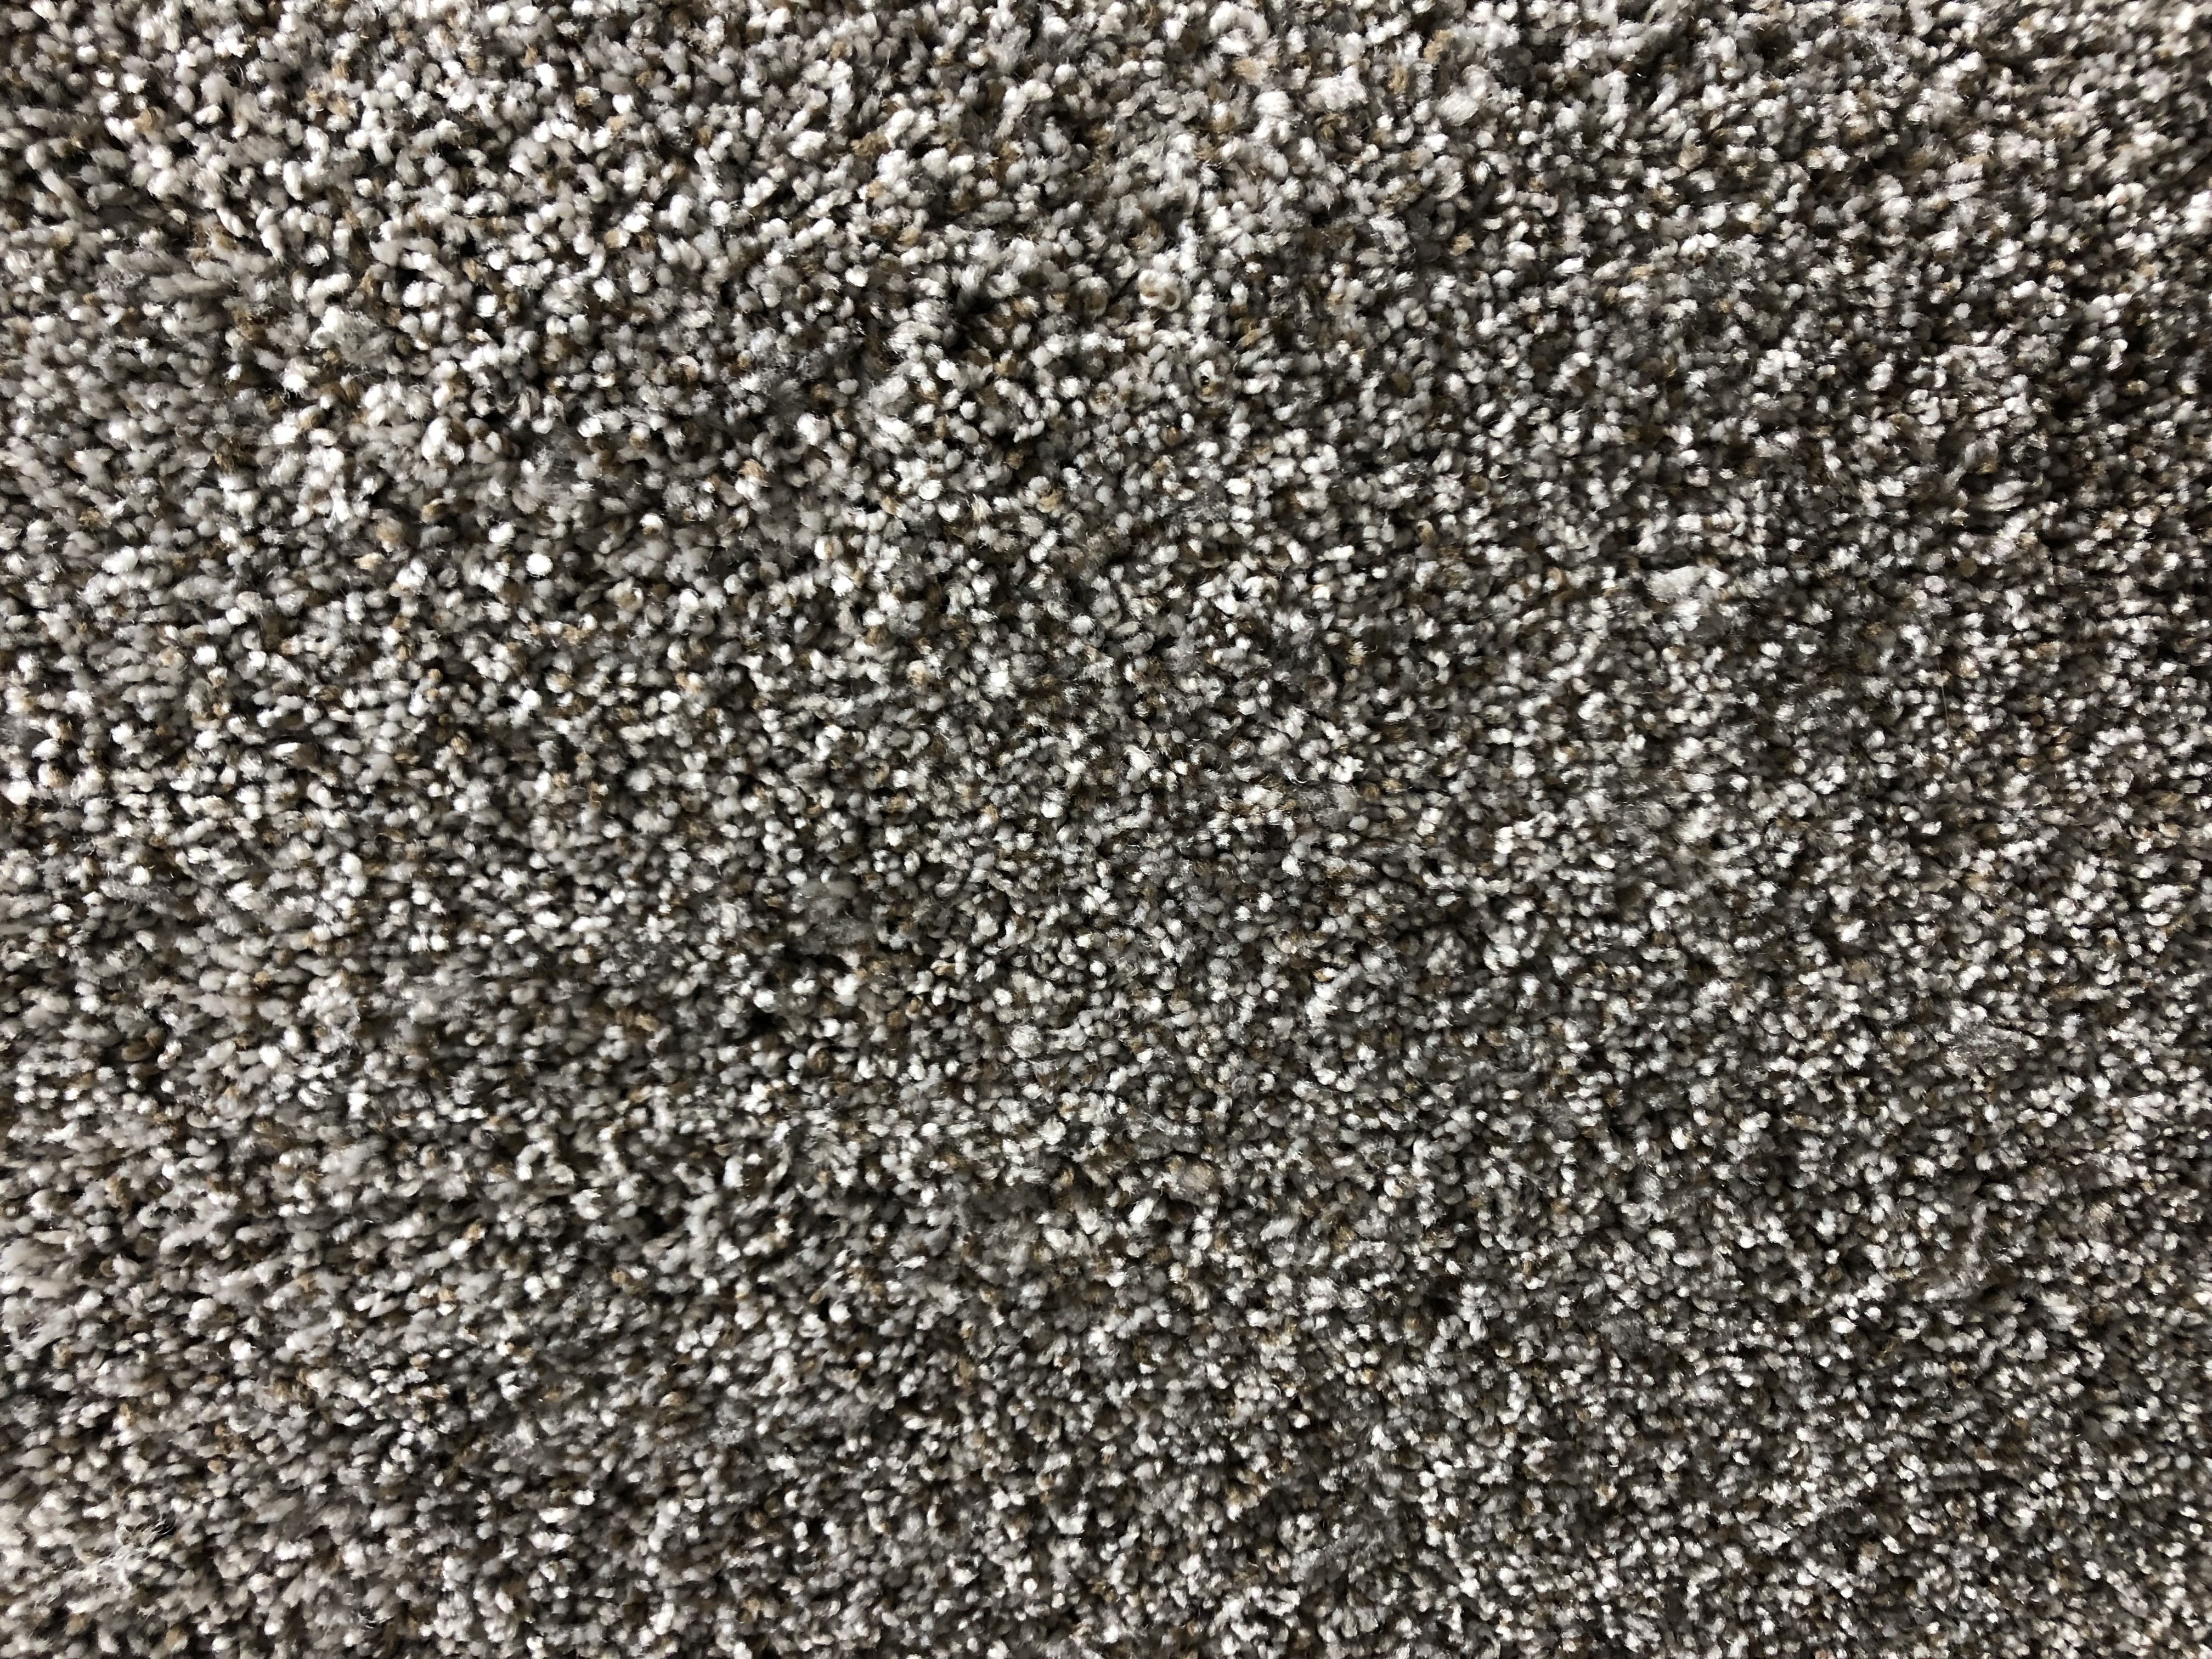 XZ170, Brushed Nickel 520 | 12' Wide